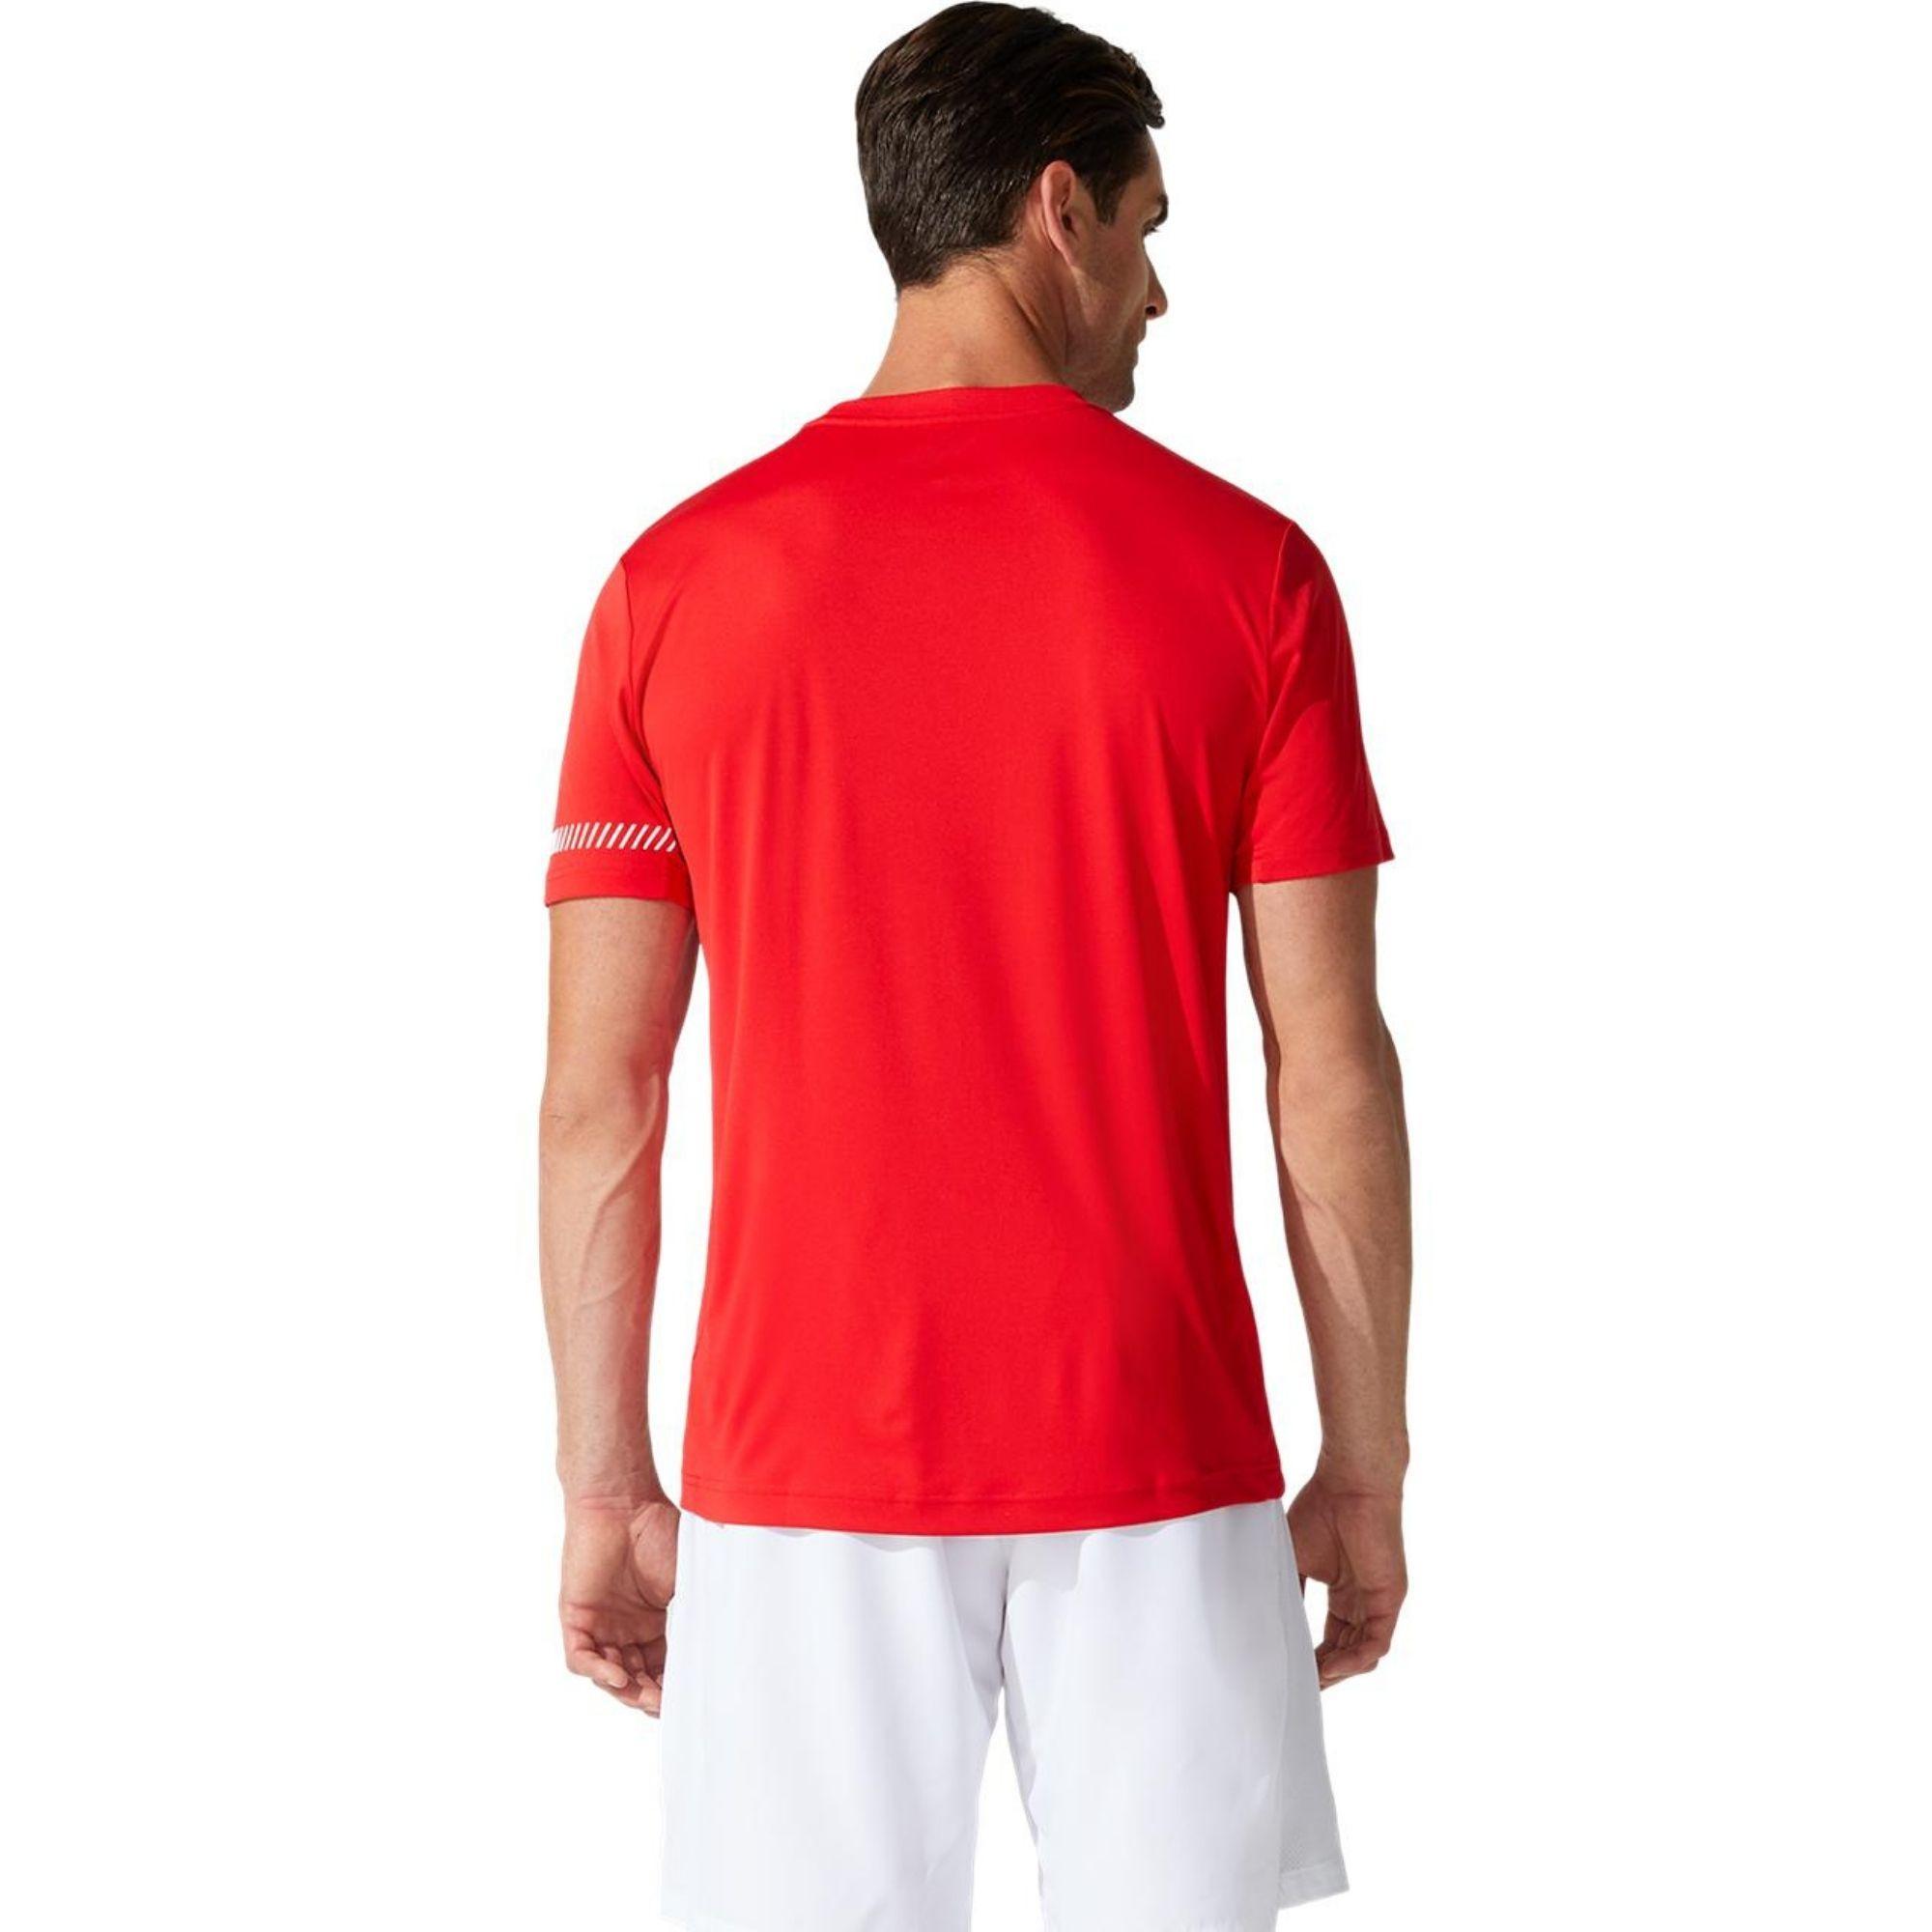 Camiseta ASICS COURT ROJA